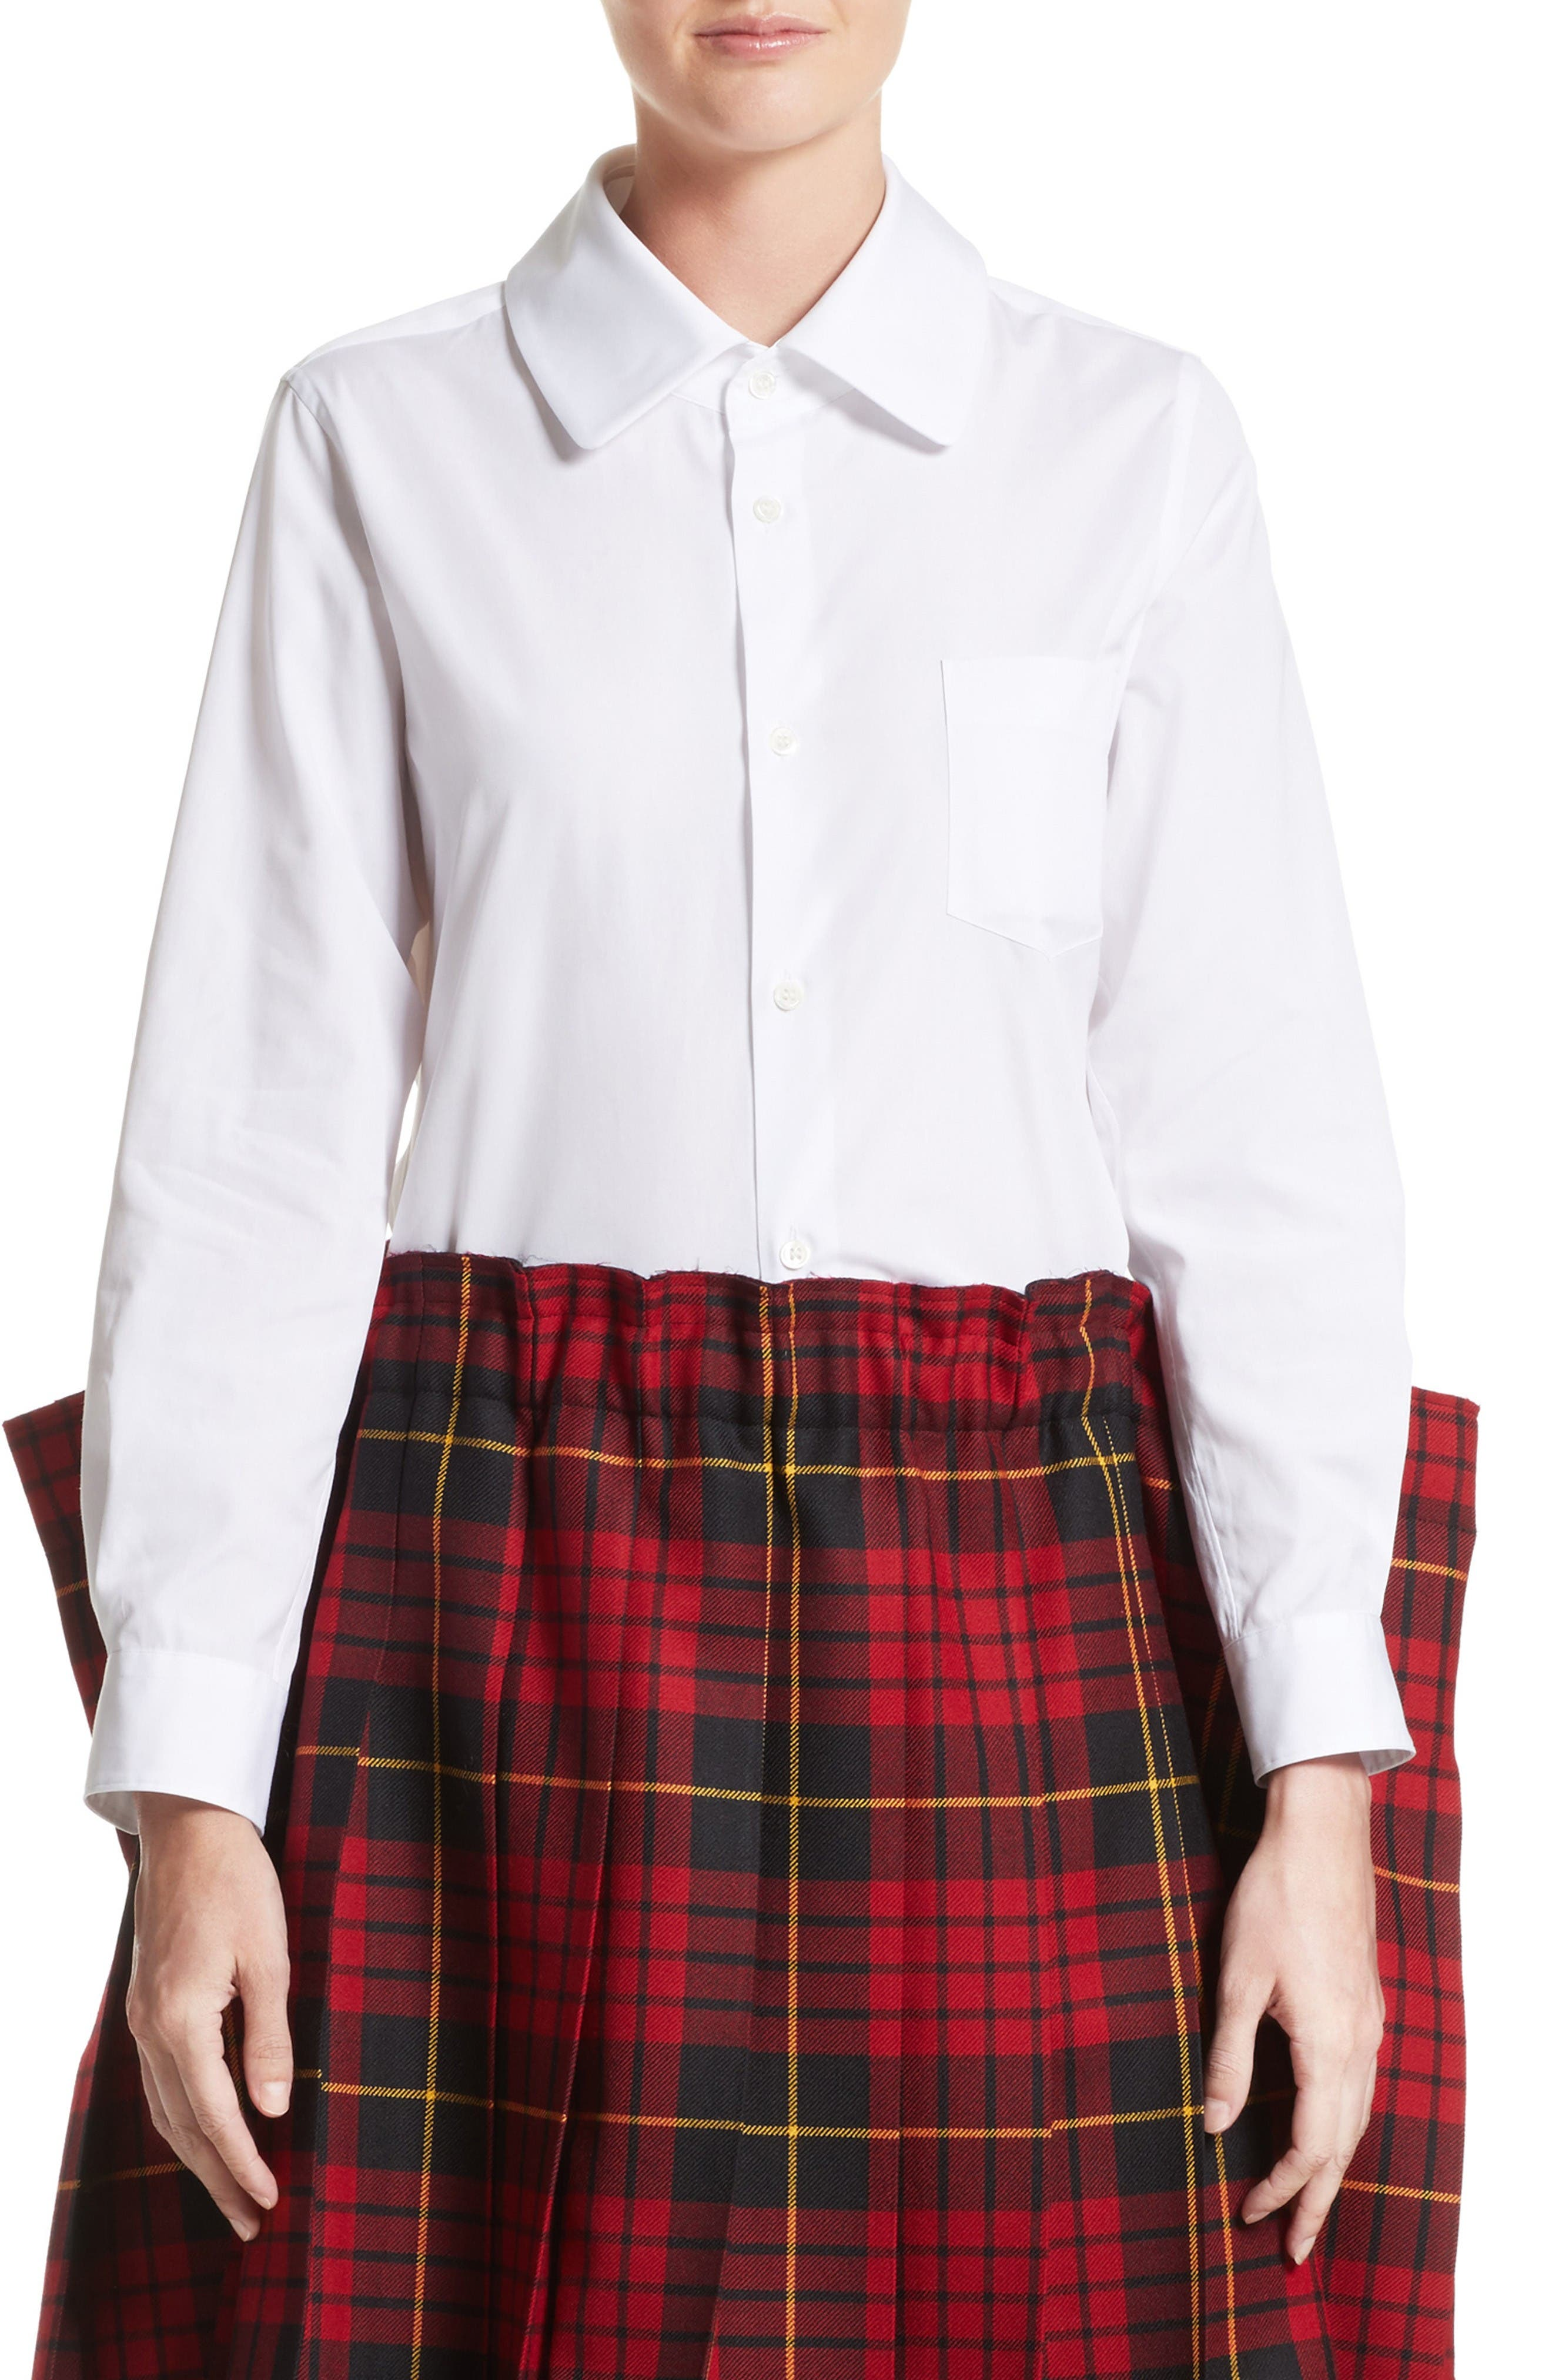 Cotton Broadcloth Blouse,                         Main,                         color, White